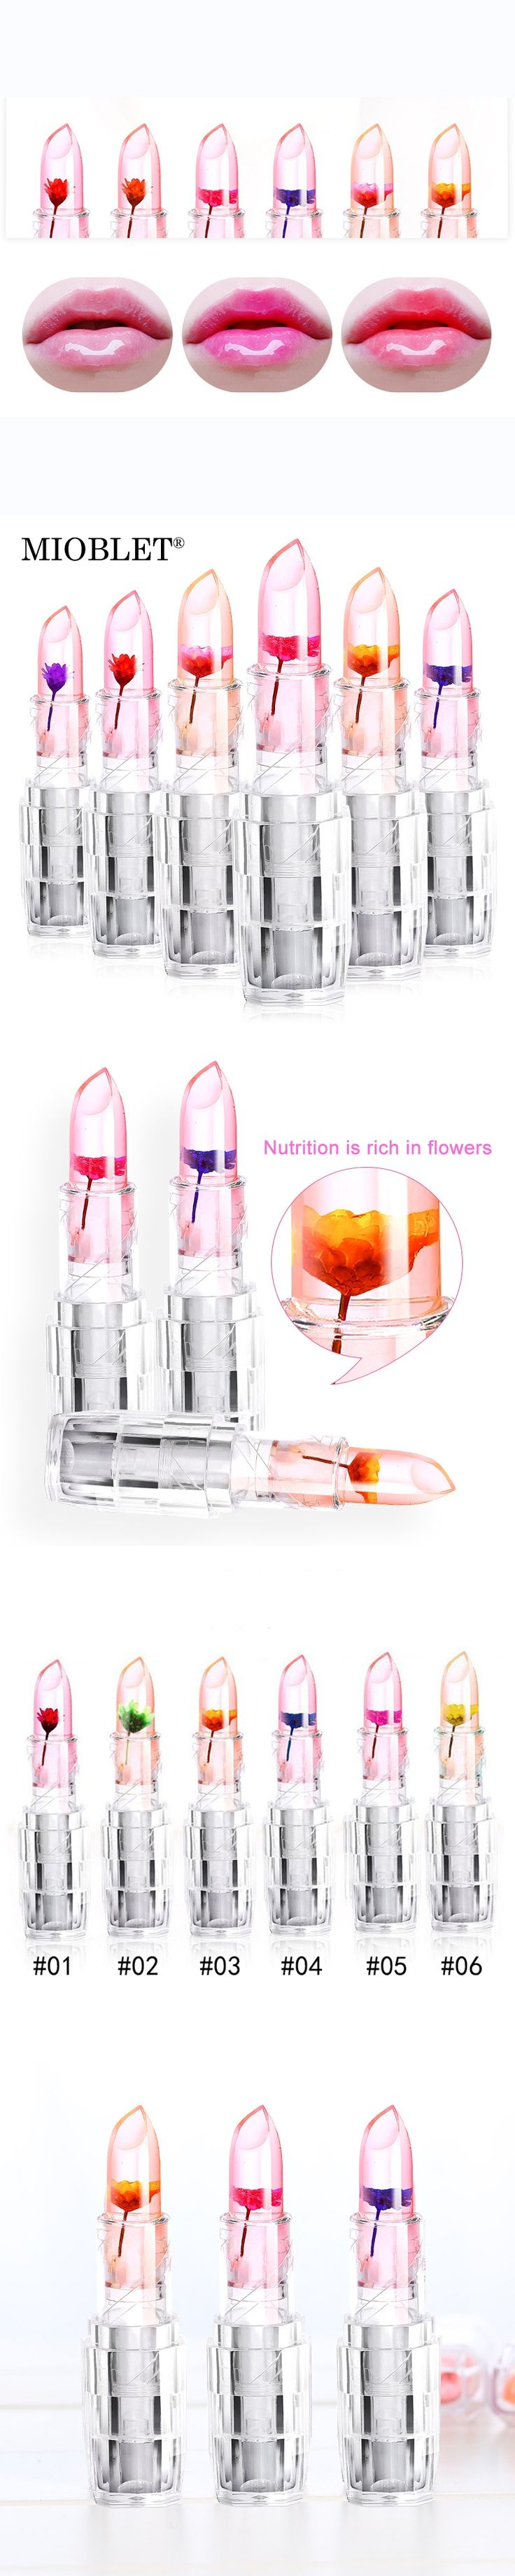 Hot Selling Flower Essence Nutritious Jelly Lipstick Waterproof Lip Care Makeup Chrysanthemum Temperature Change Lip Stick Gloss